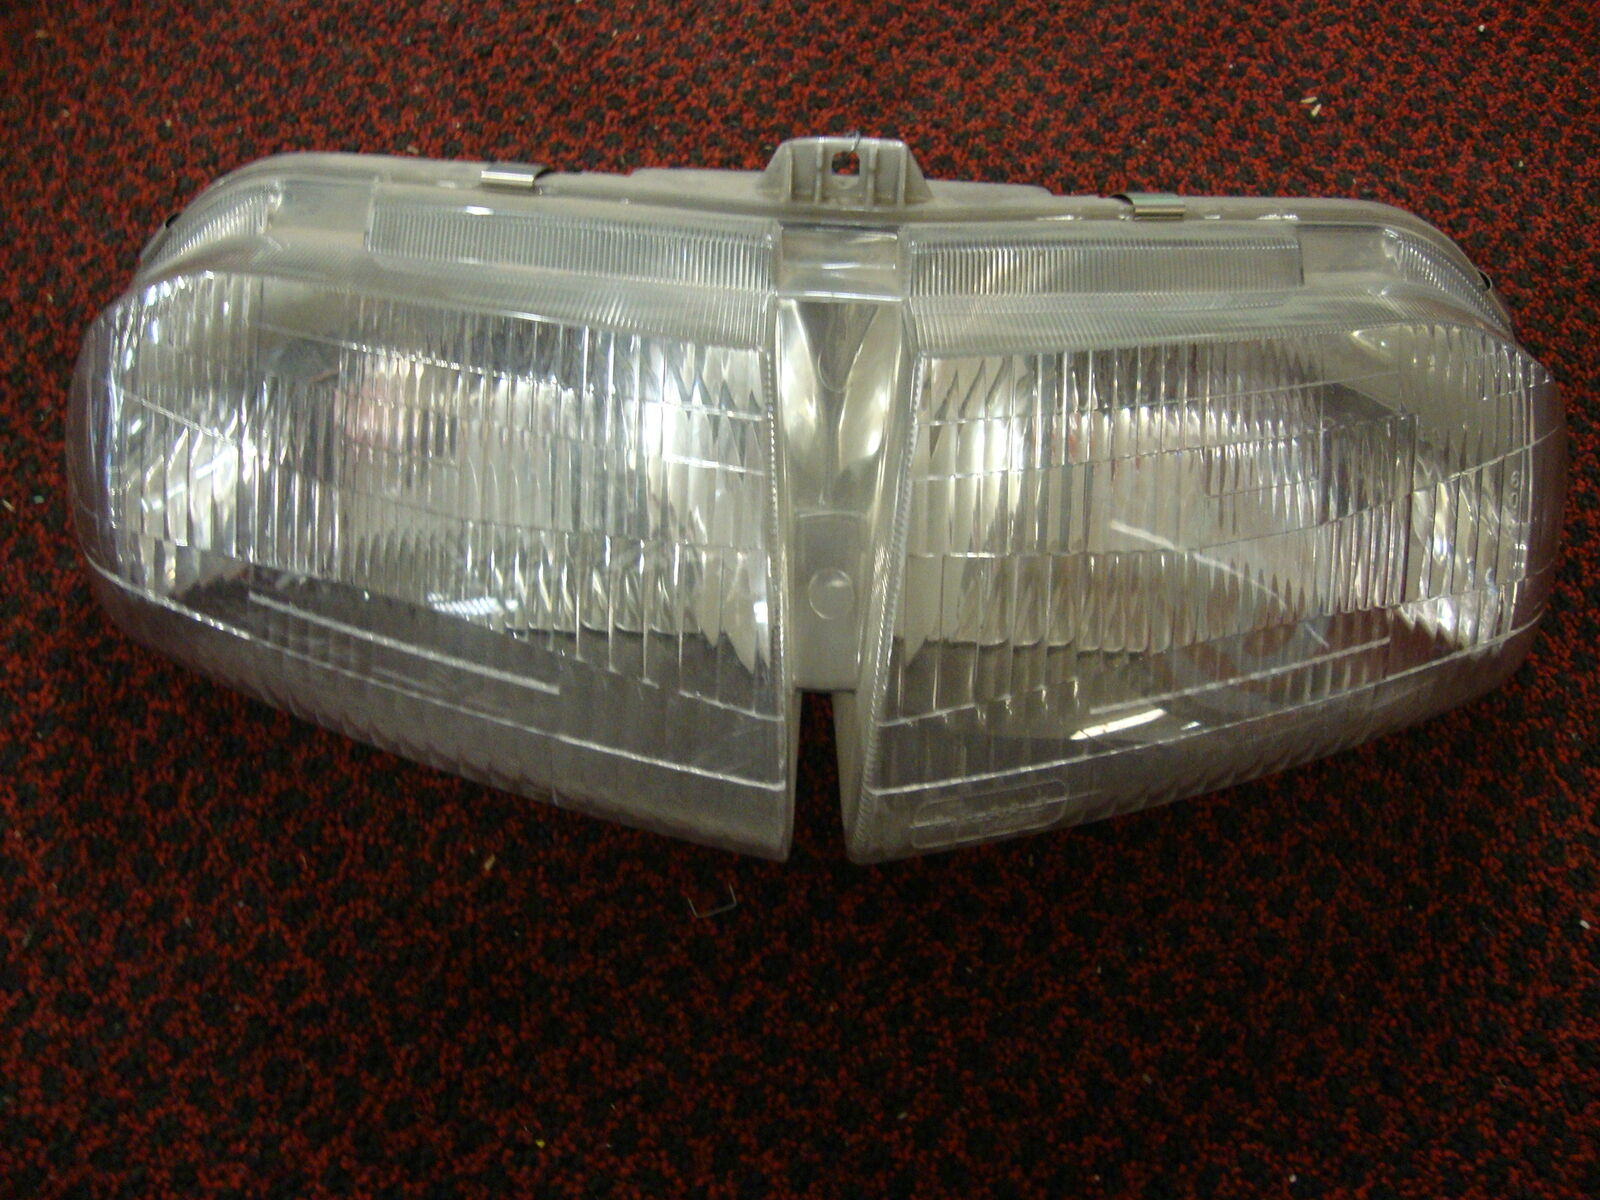 1997 Polaris Ultra SPX 680 FRONT HEAD LIGHT LAMP HEADLIGHT 2431009